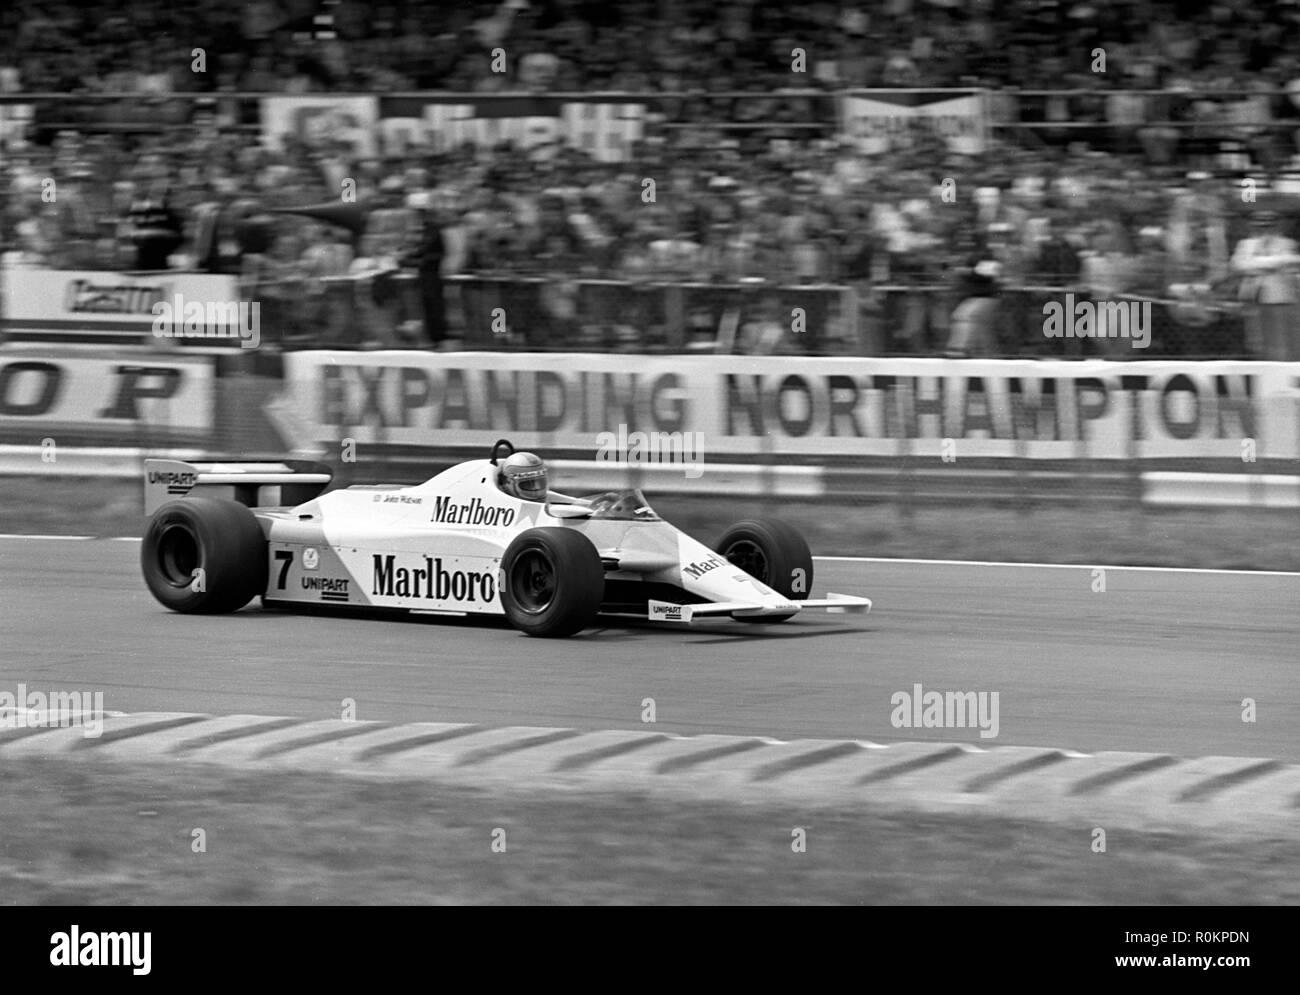 1981 McLaren MP4-1 John Watson. Winner 1981 British Grand Prix, Silverstone - Stock Image